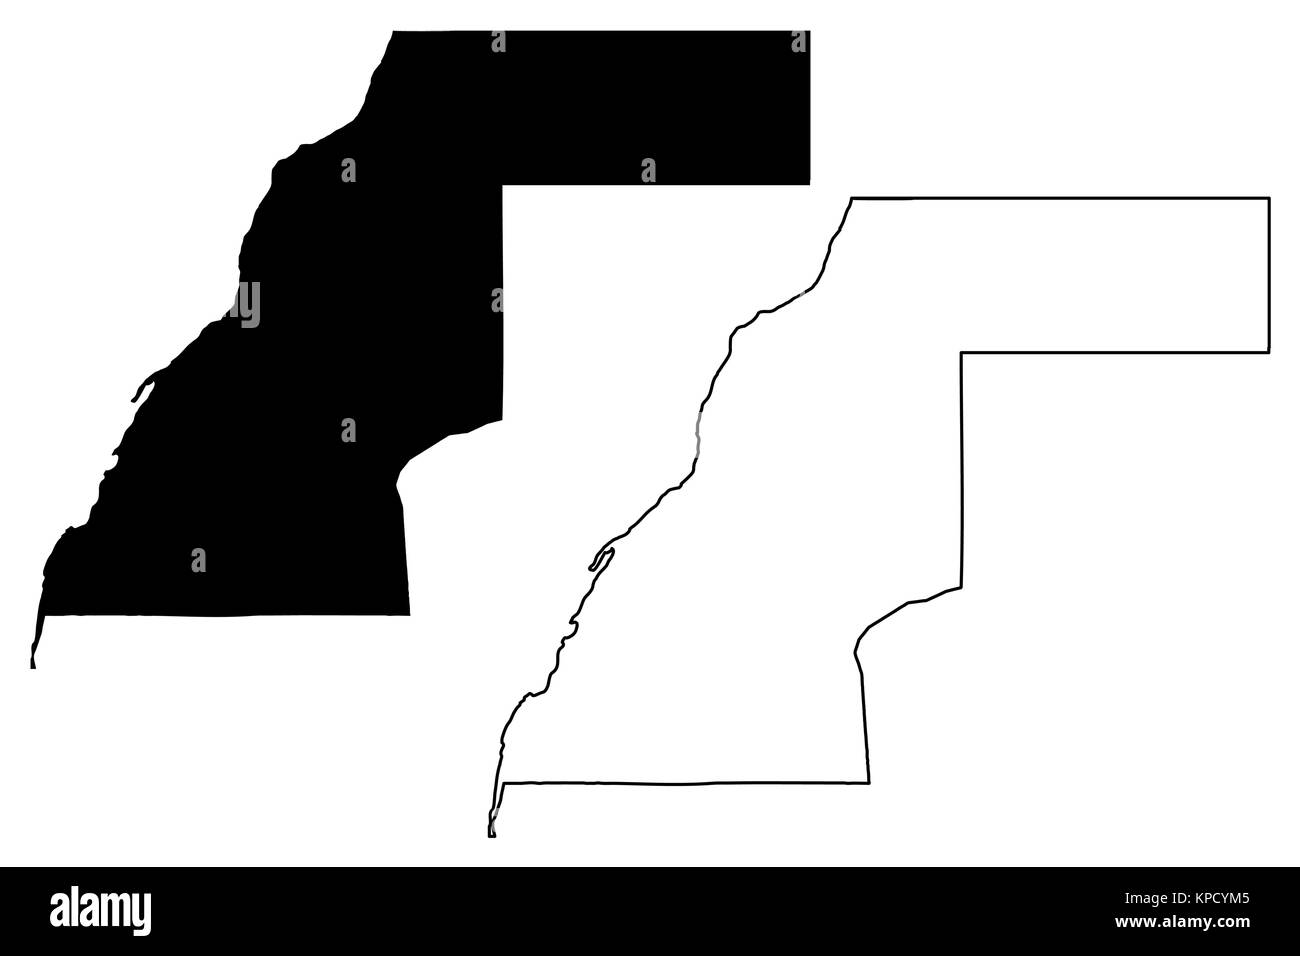 Western Sahara map vector illustration, scribble sketch Sahrawi Arab Democratic Republic - Stock Image